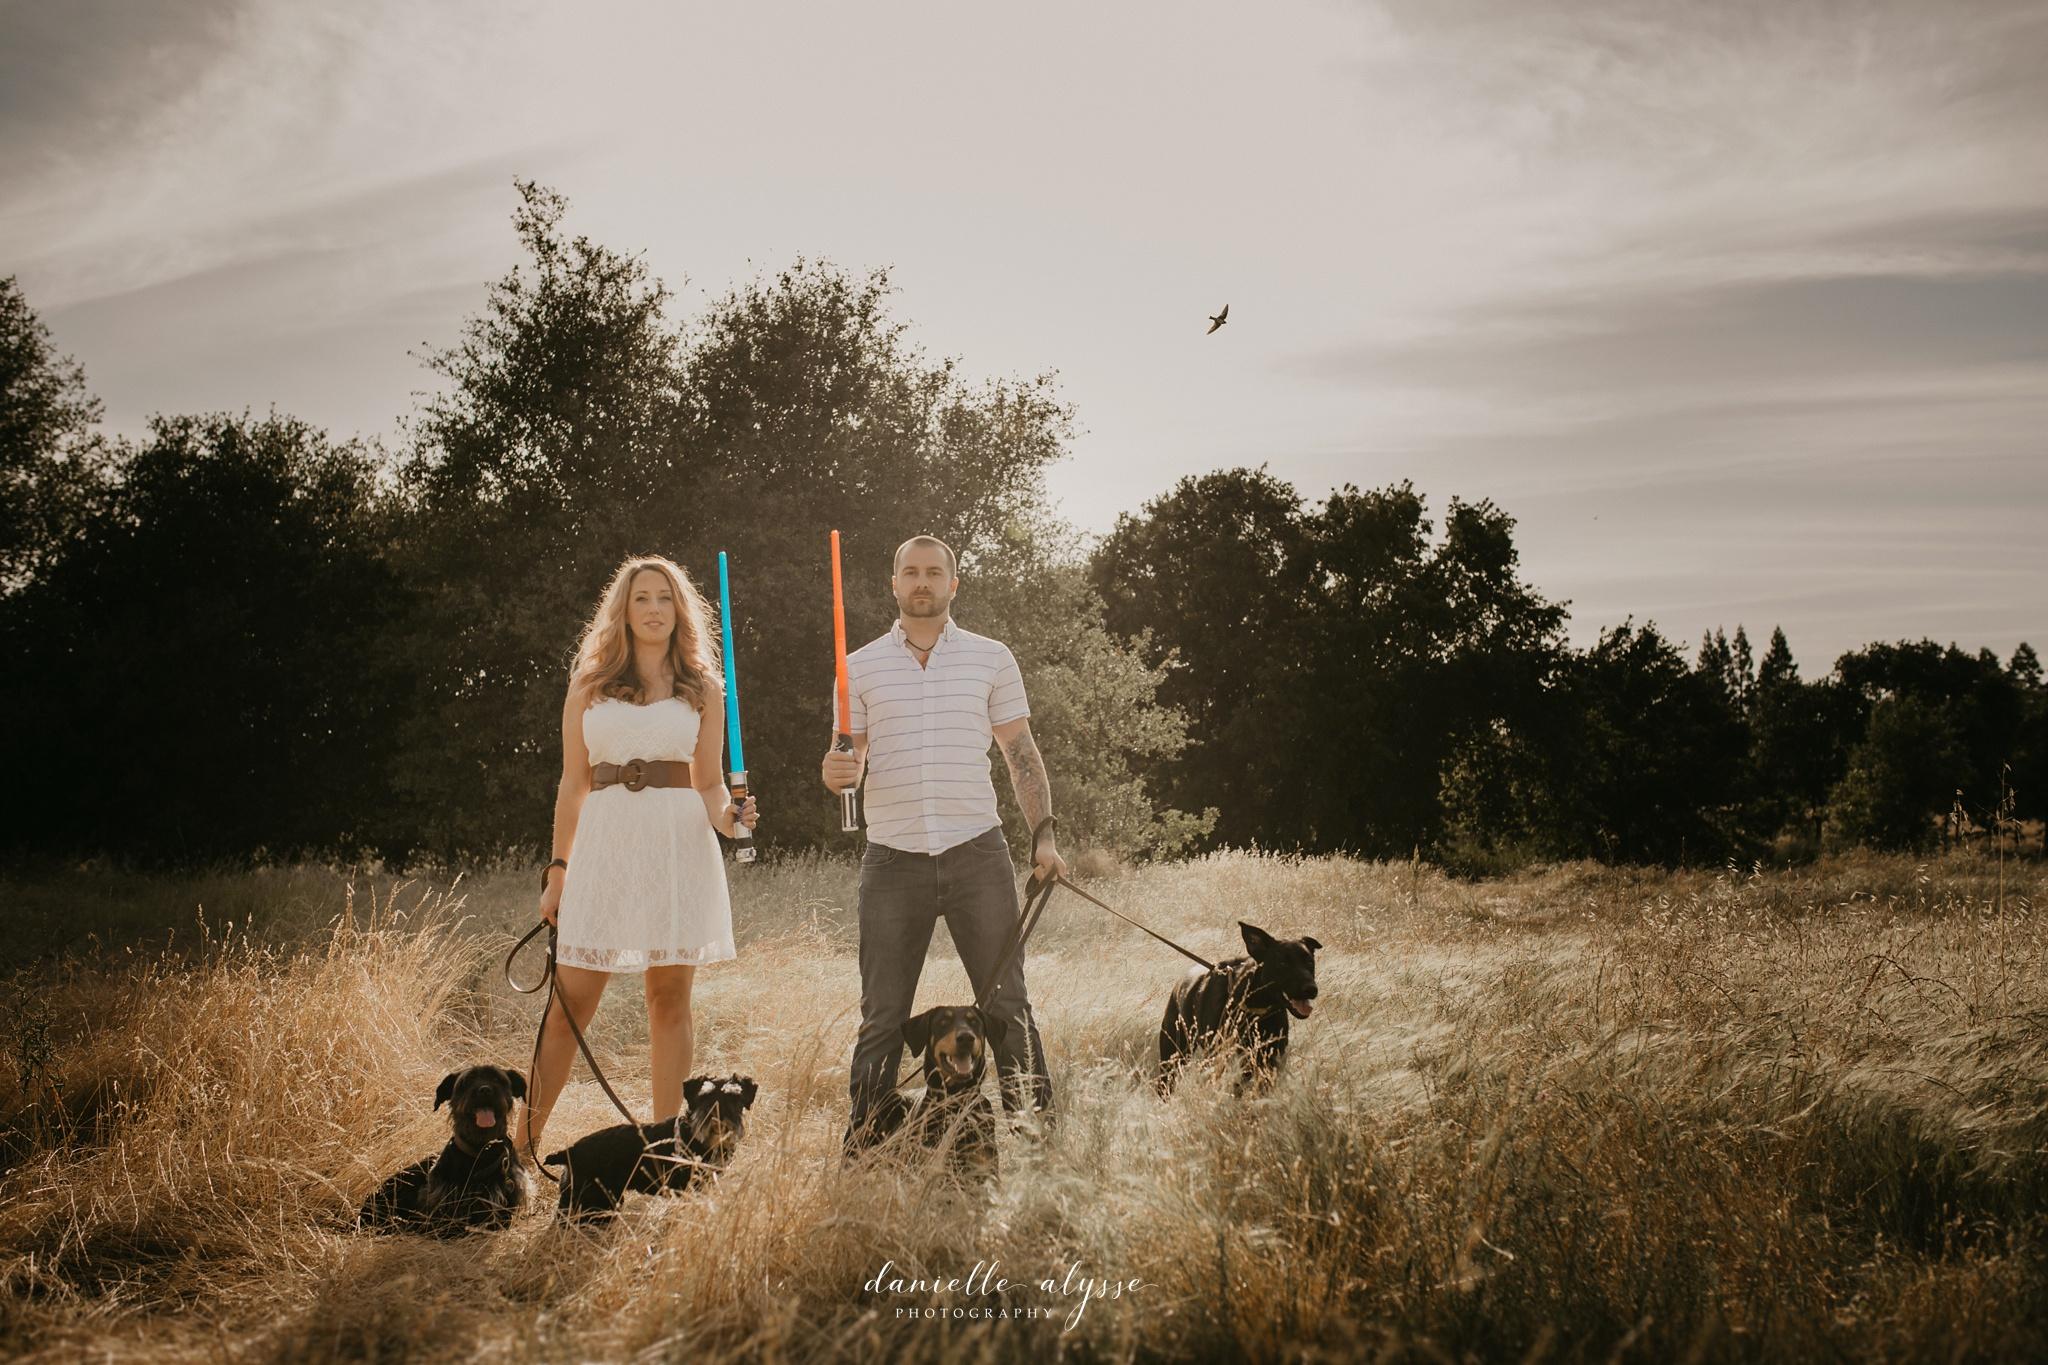 180520_engagement_sarah_jon_dogs_danielle_alysse_photography_elk_grove_photographer_blog_6_WEB.jpg